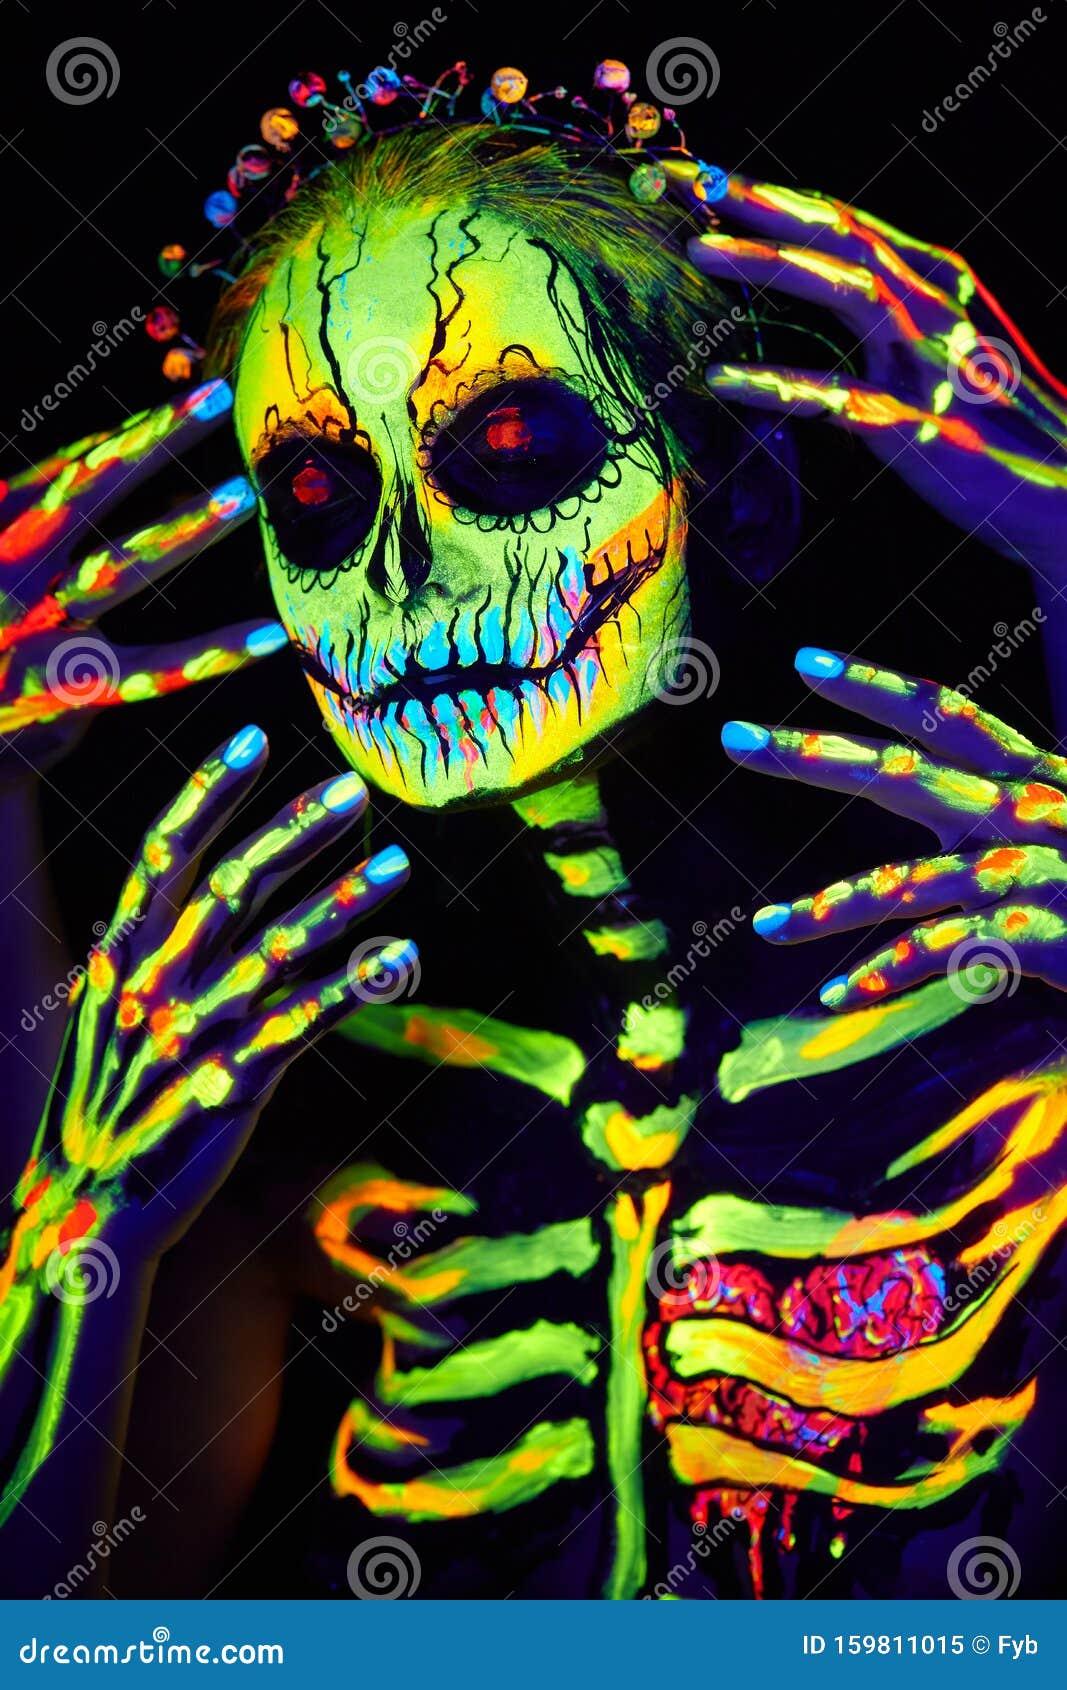 Uv Body Art Painting Of Helloween Female Skeleton Stock Image Image Of Celebration Culture 159811015